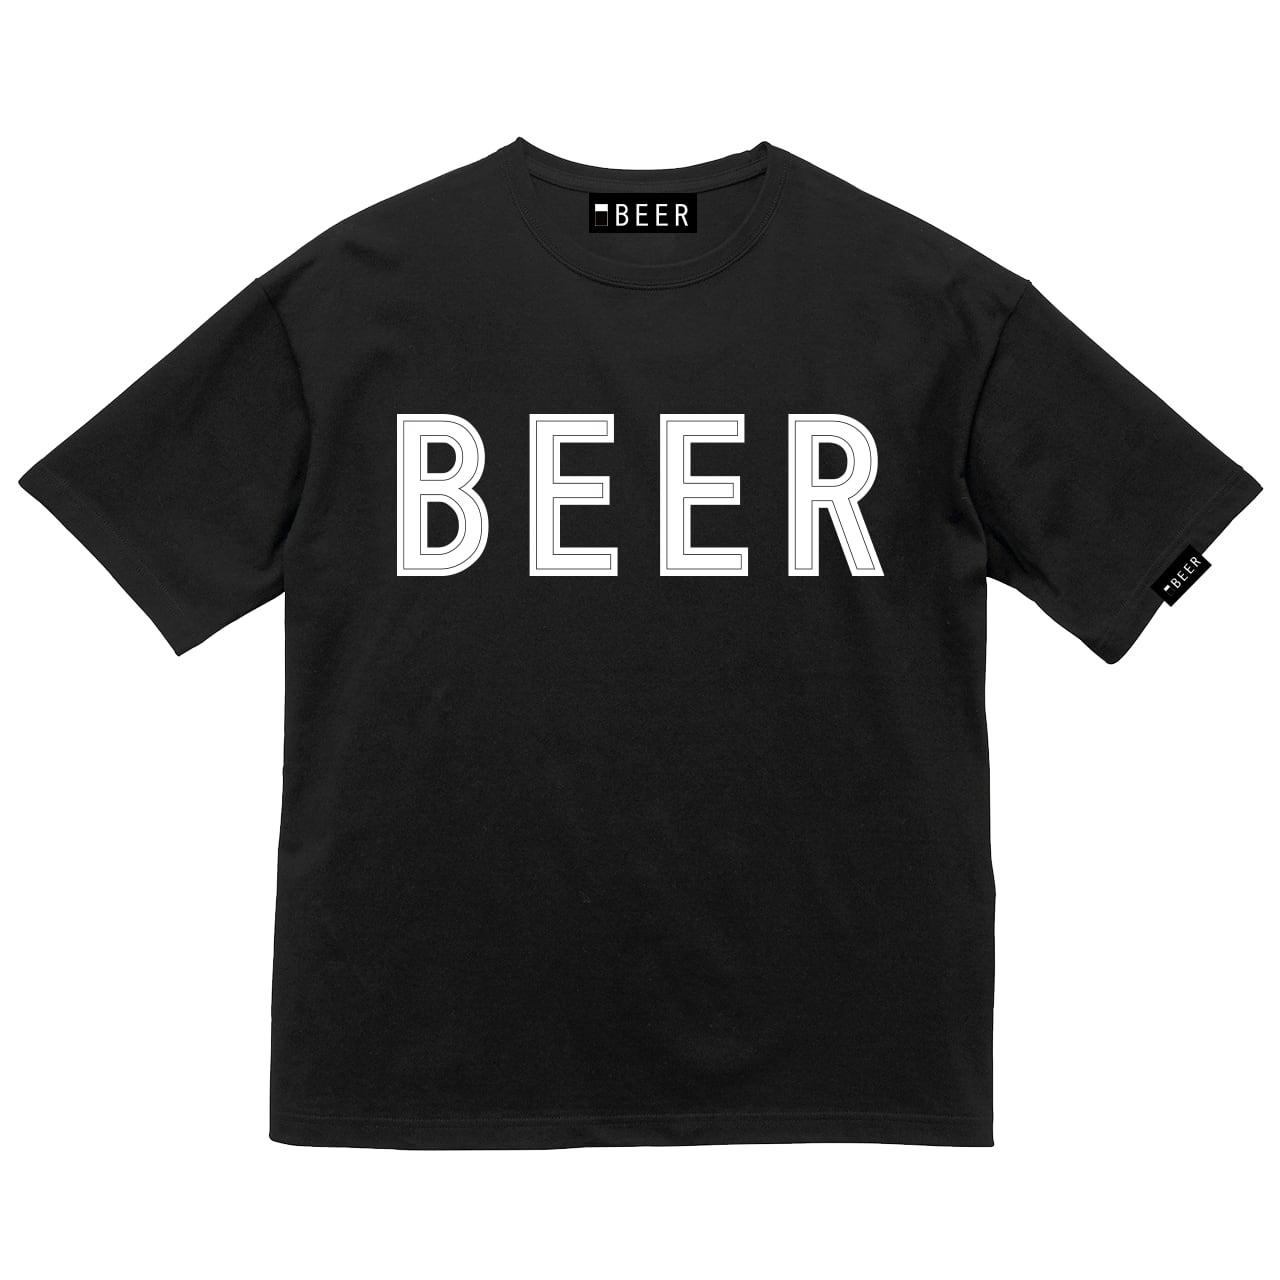 BEER アップリケロゴT ブラック